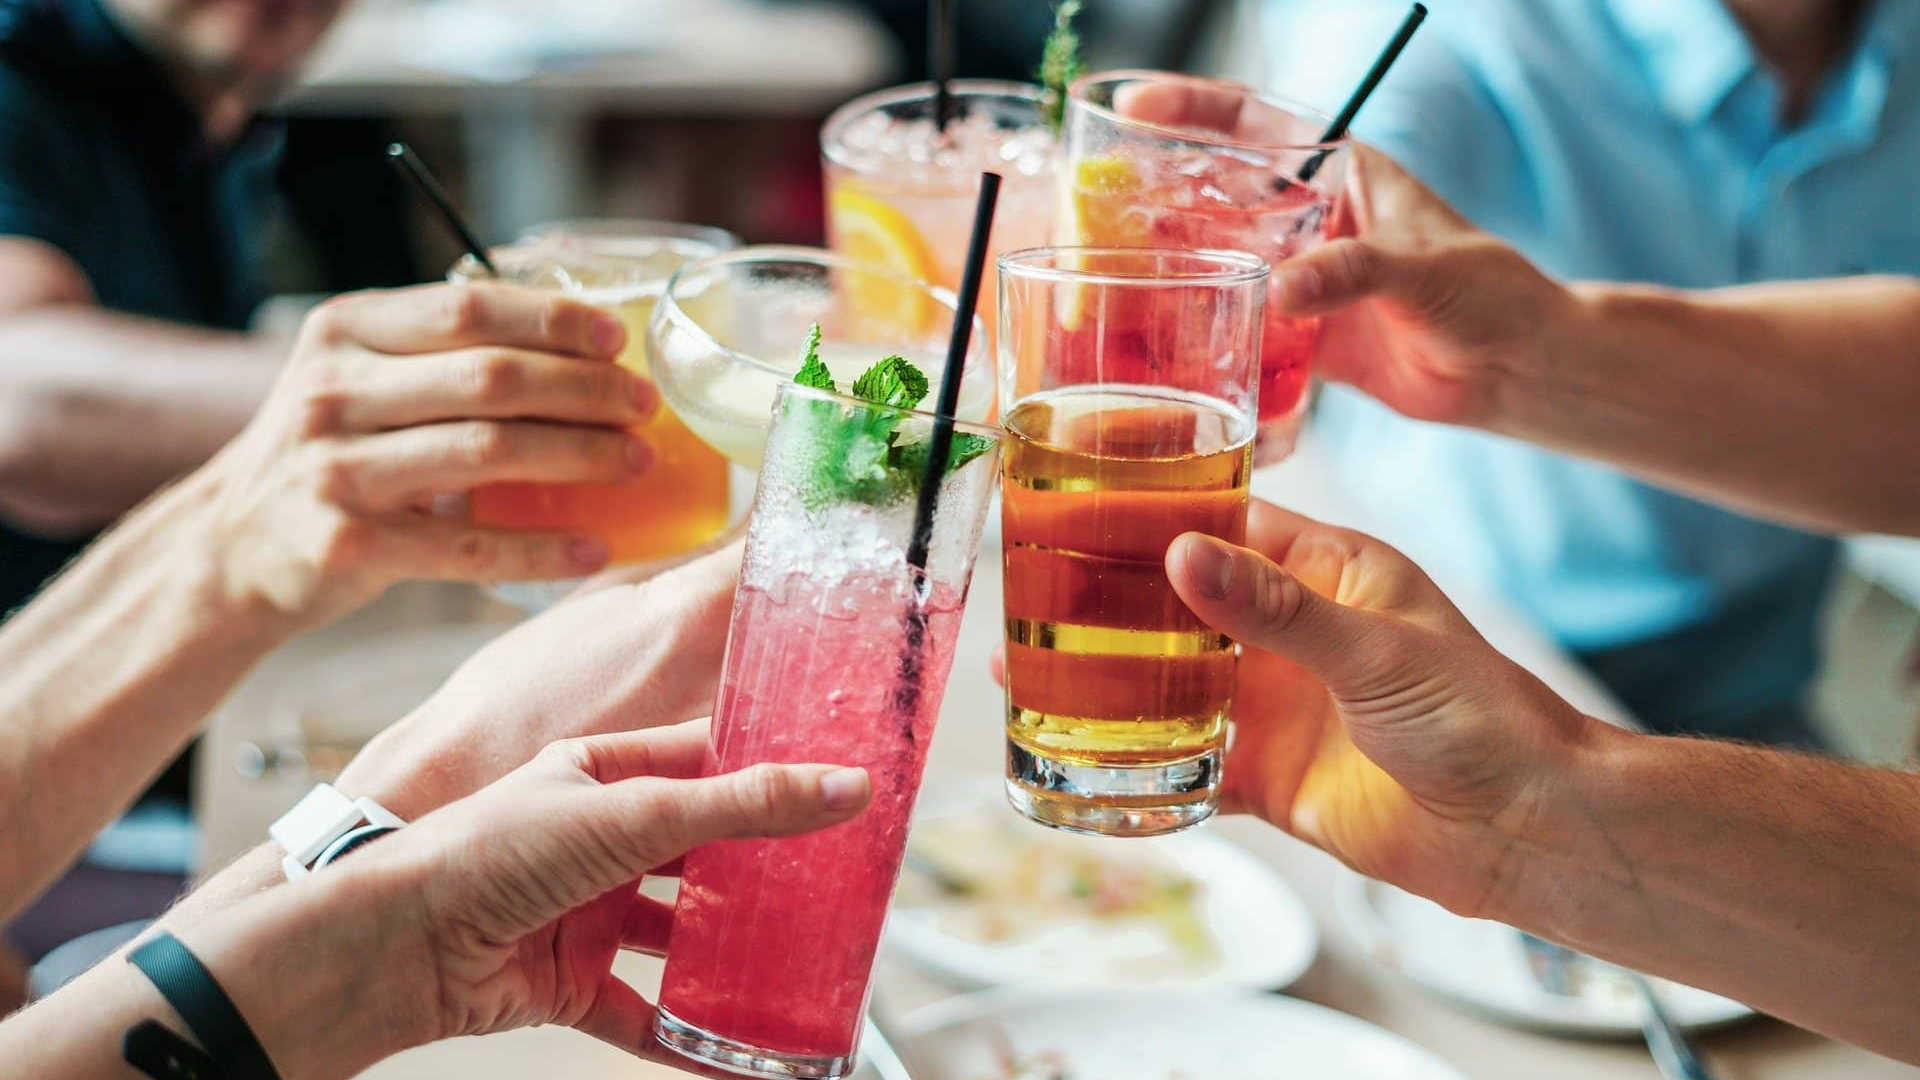 drinks-2578446_1920 (1) (1).jpg